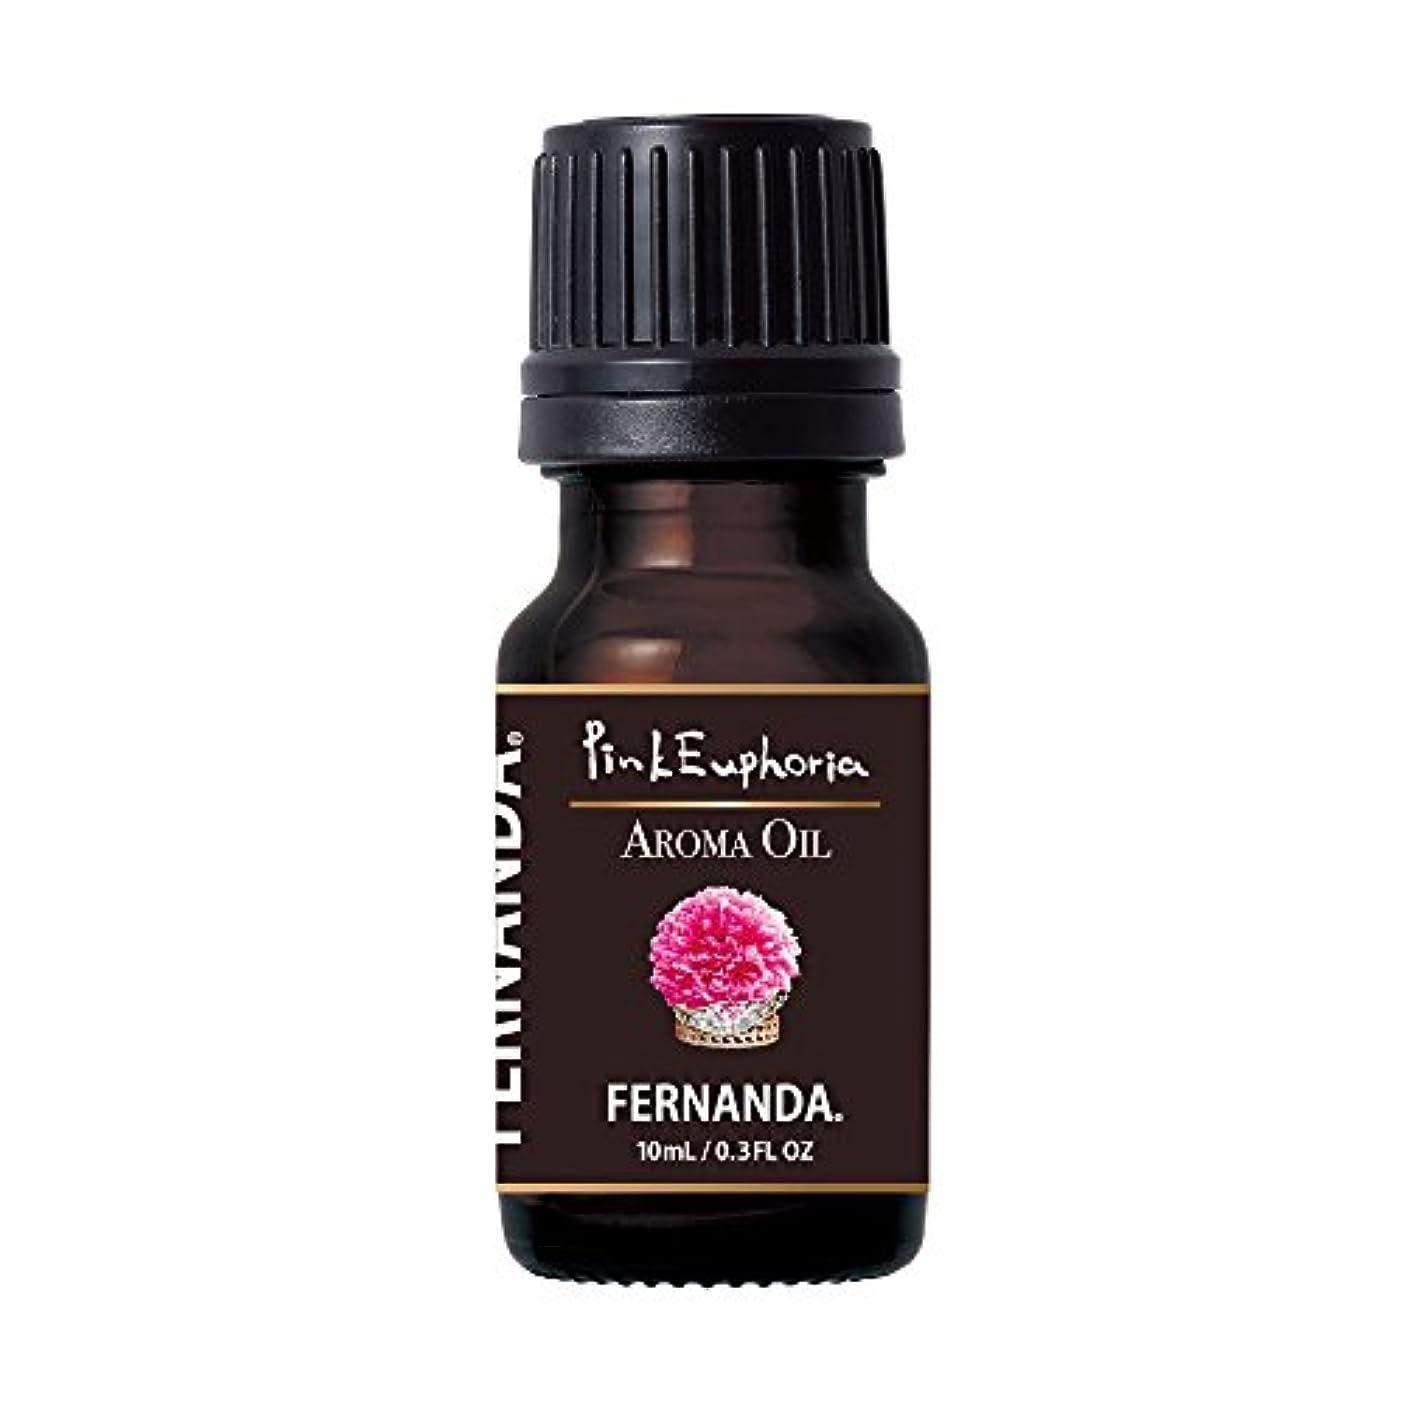 FERNANDA(フェルナンダ) Fragrance Aroma Oil Pink Euphoria (アロマオイル ピンクエウフォリア)